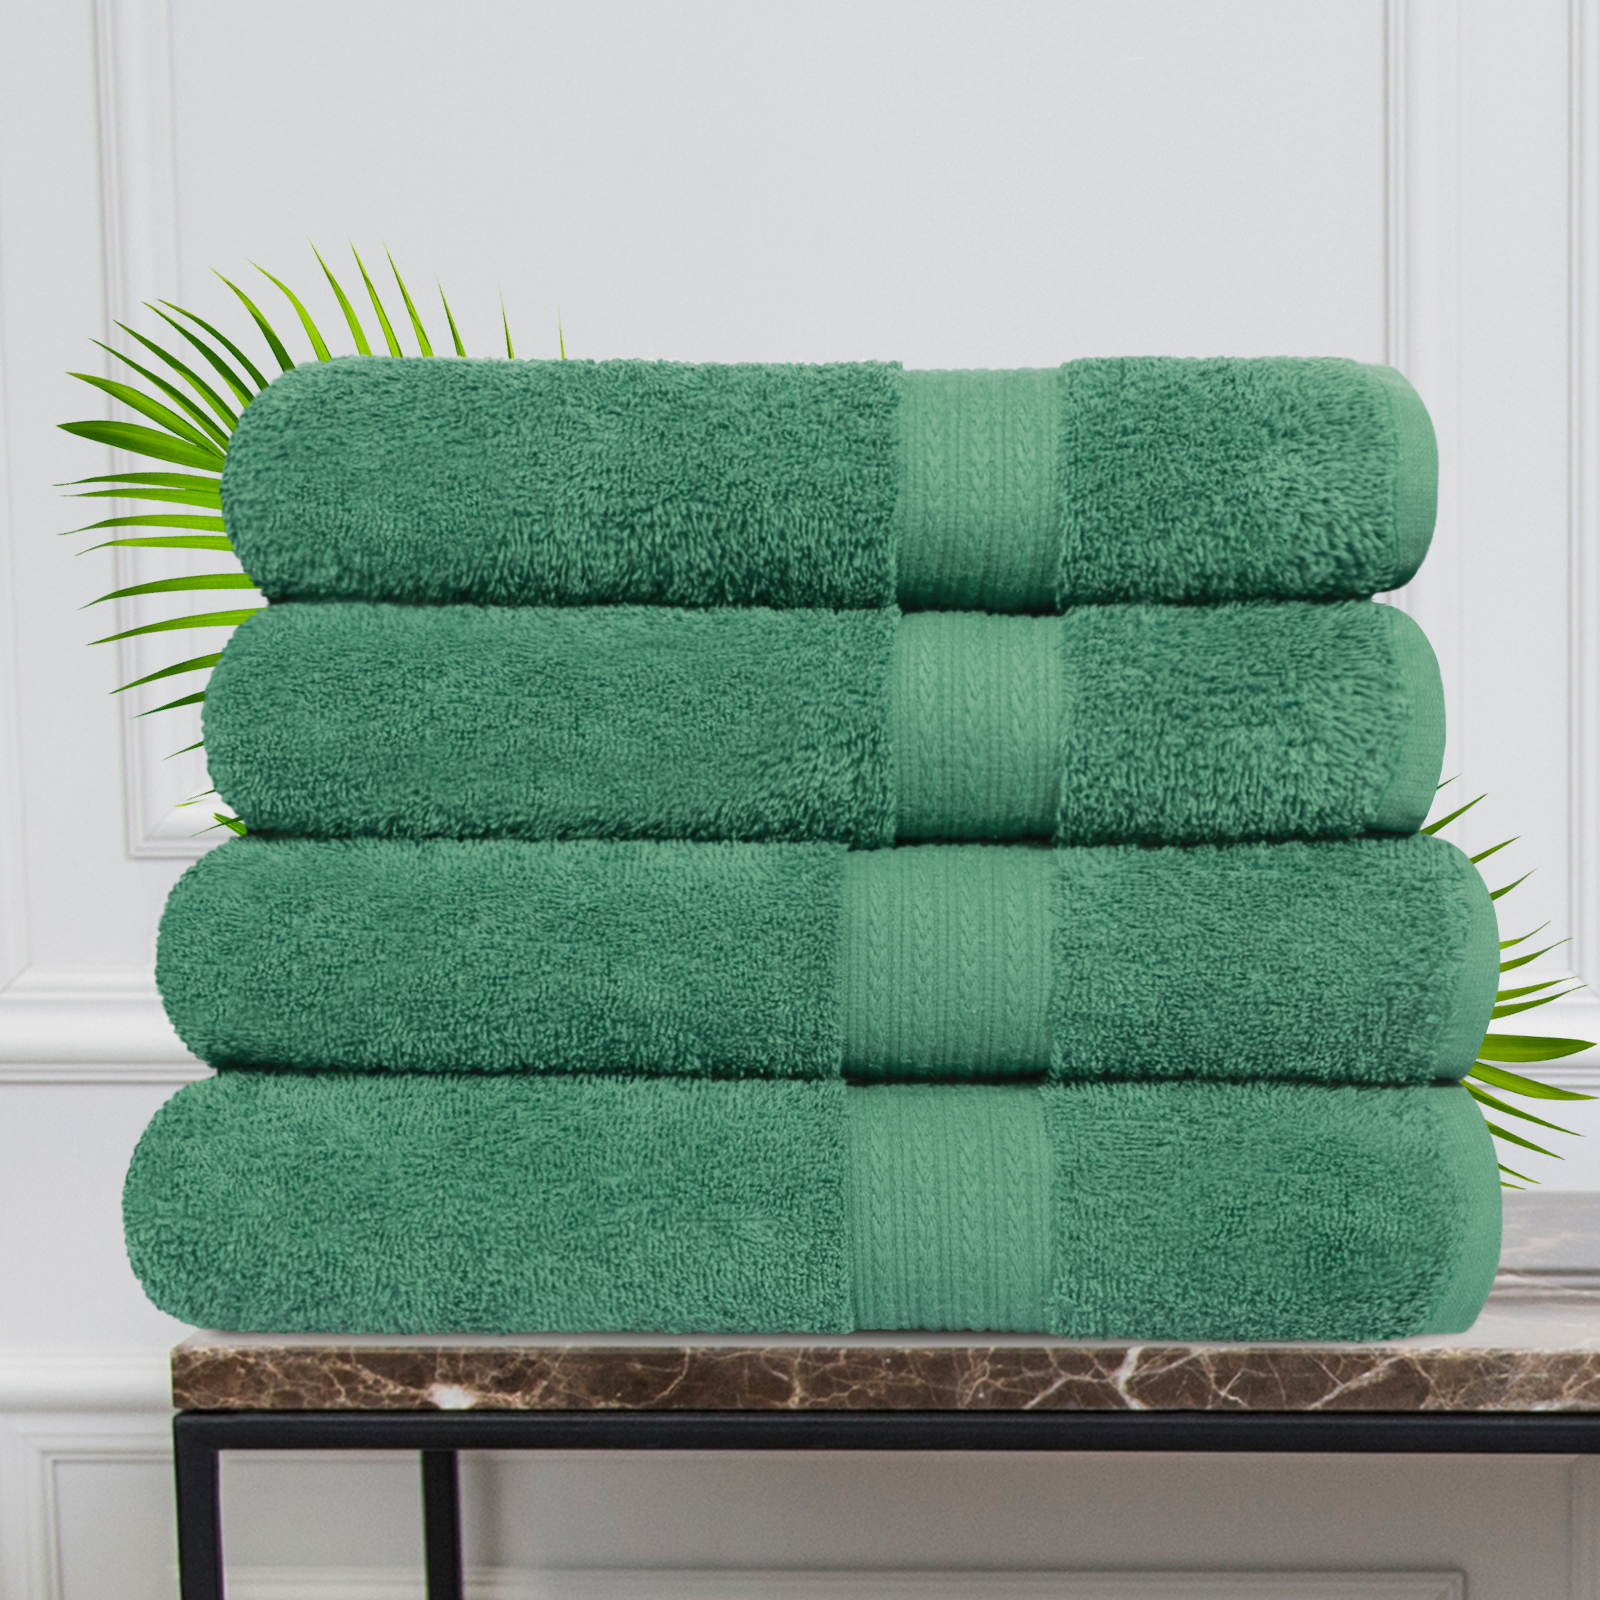 Набор из 4 полотенец Morocco Цвет: Зеленый (50х90 см - 2 шт, 70х140 см - 2 шт)